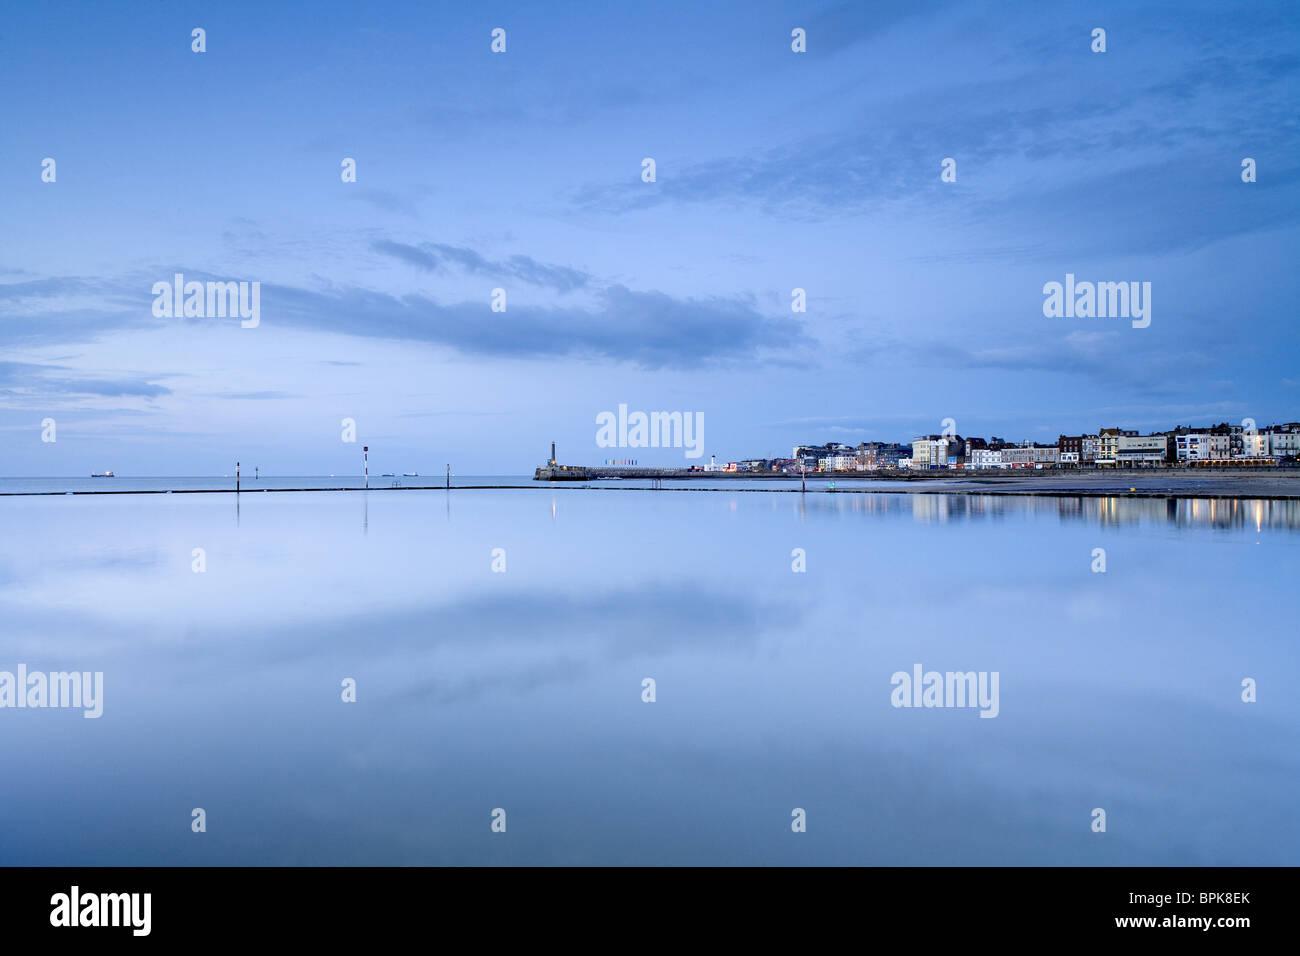 Cidade costeira de Margate, Kent, Inglaterra, Grã-Bretanha, Europa Imagens de Stock